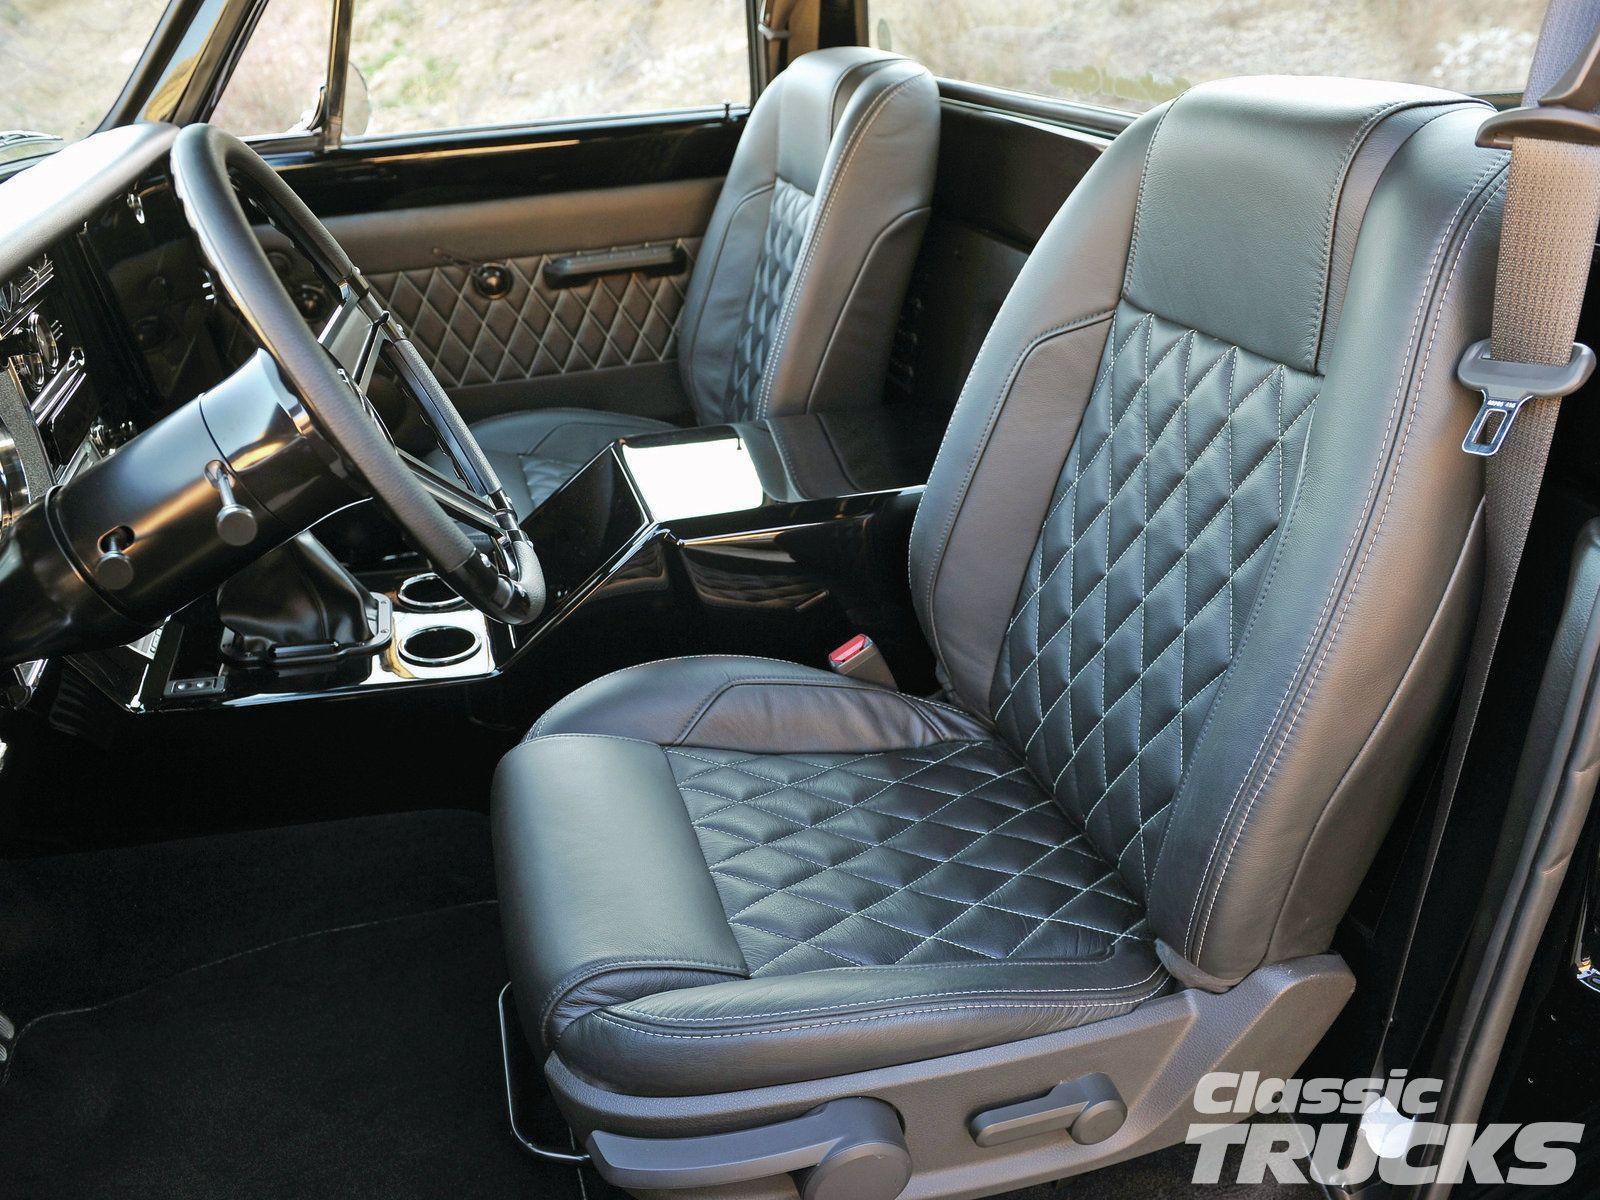 1968 chevy creations n chrome s classic trucks magazine